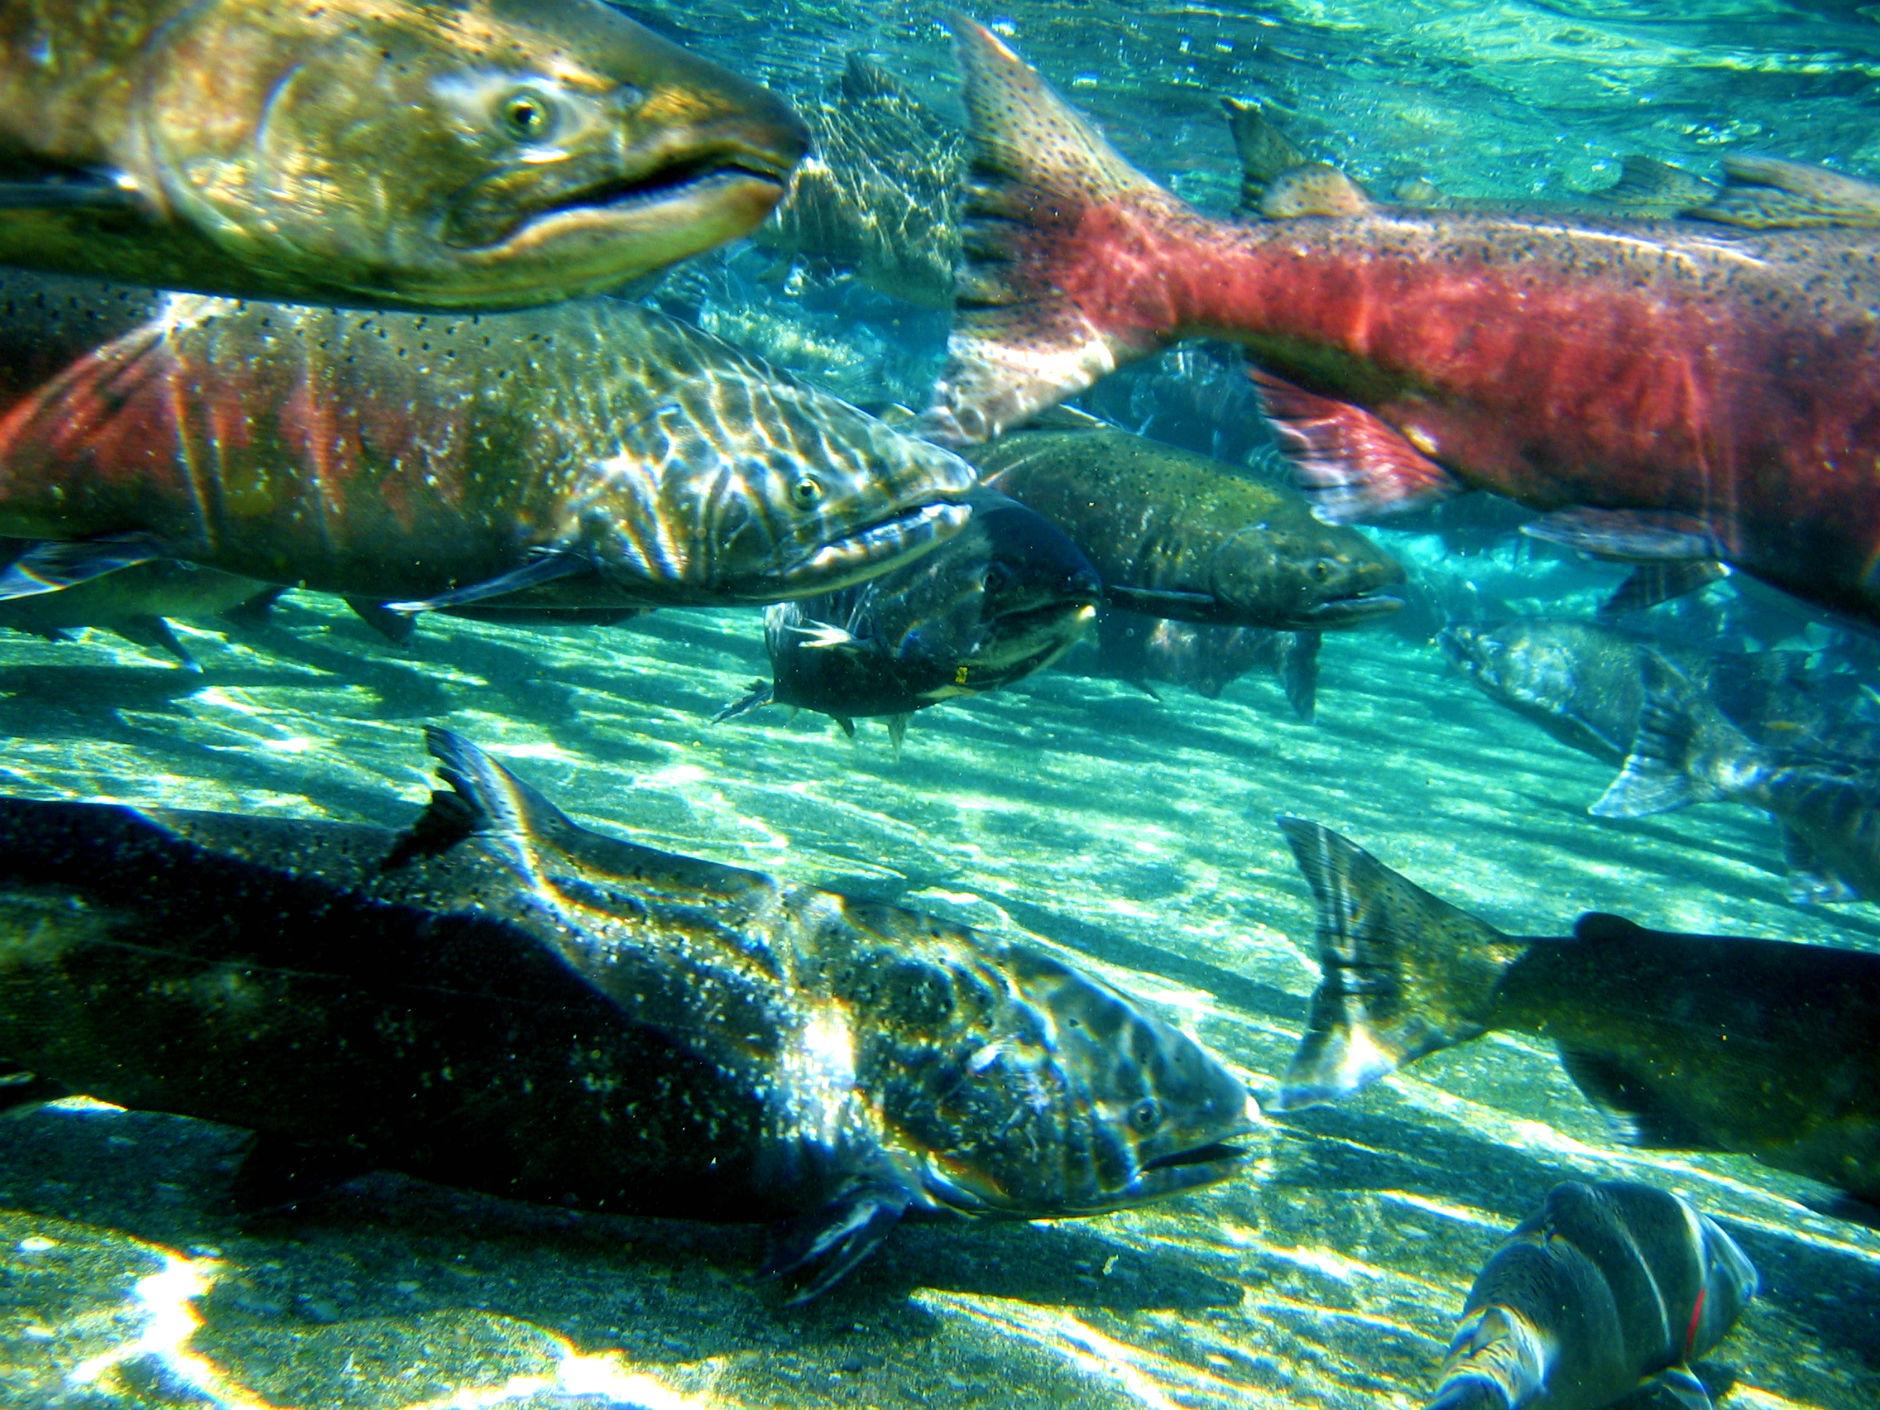 salmon fish river underwater t3 wallpaper background 1880x1410